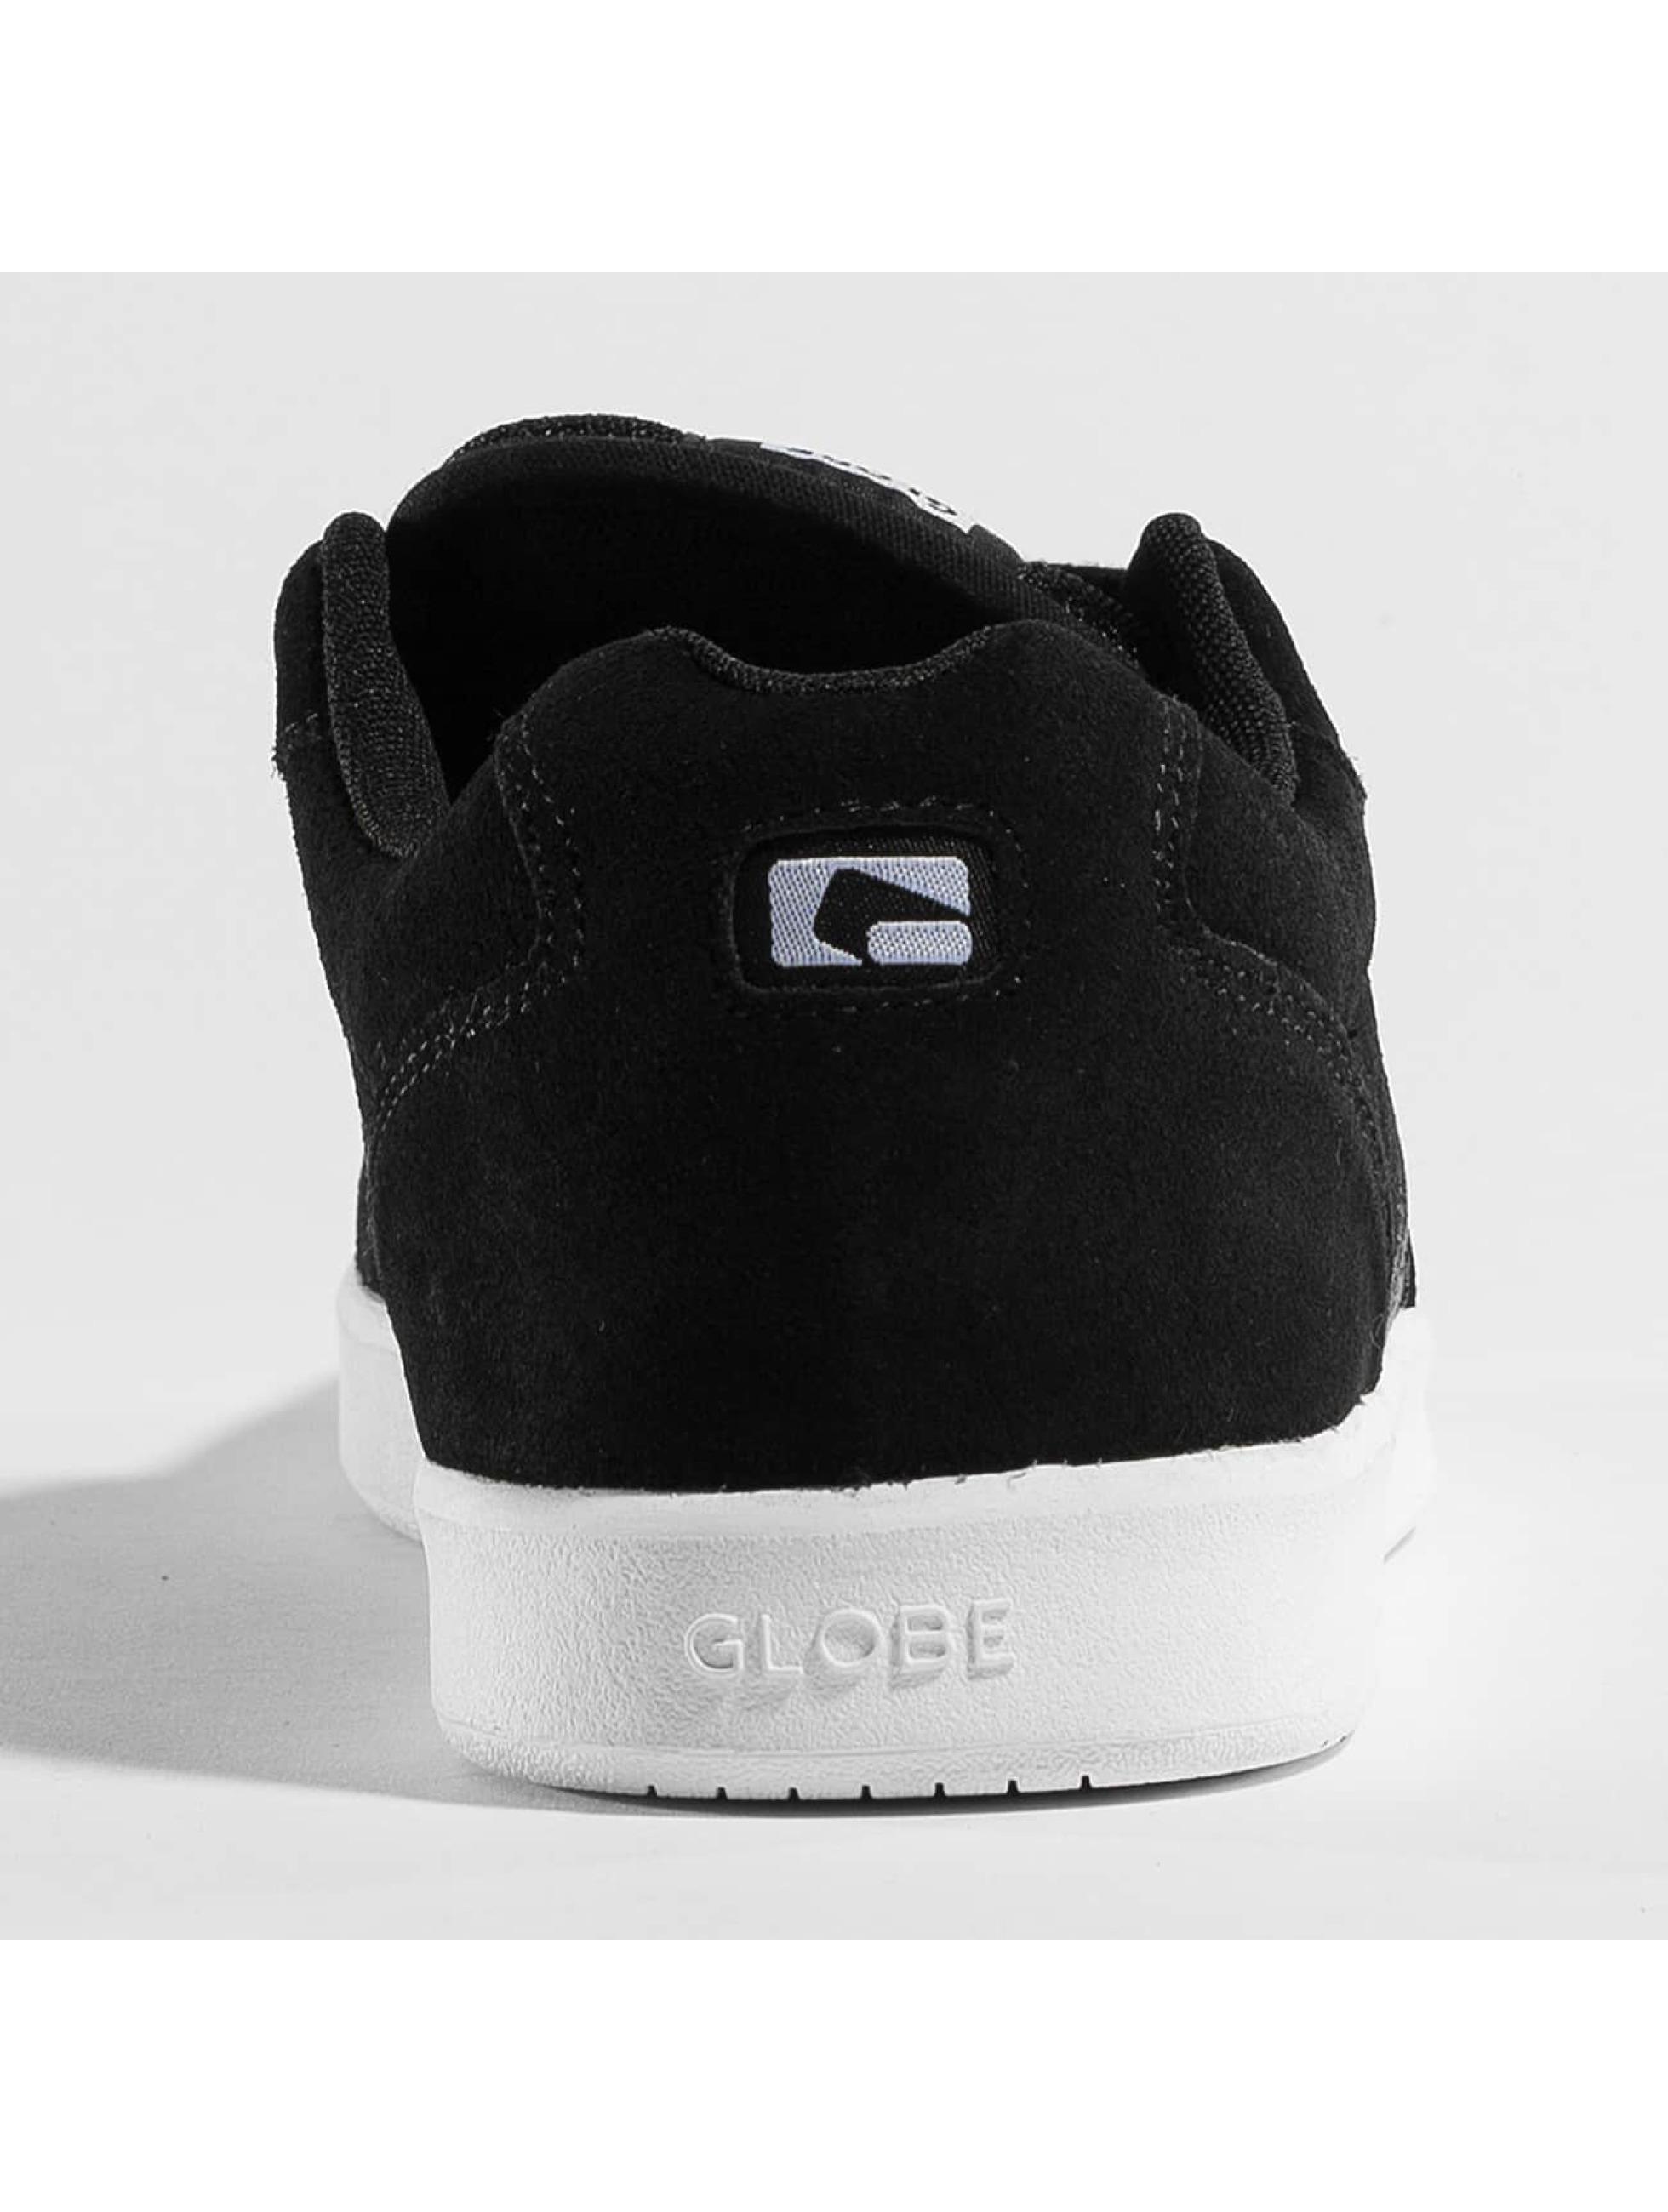 Globe Sneakers Octave czarny